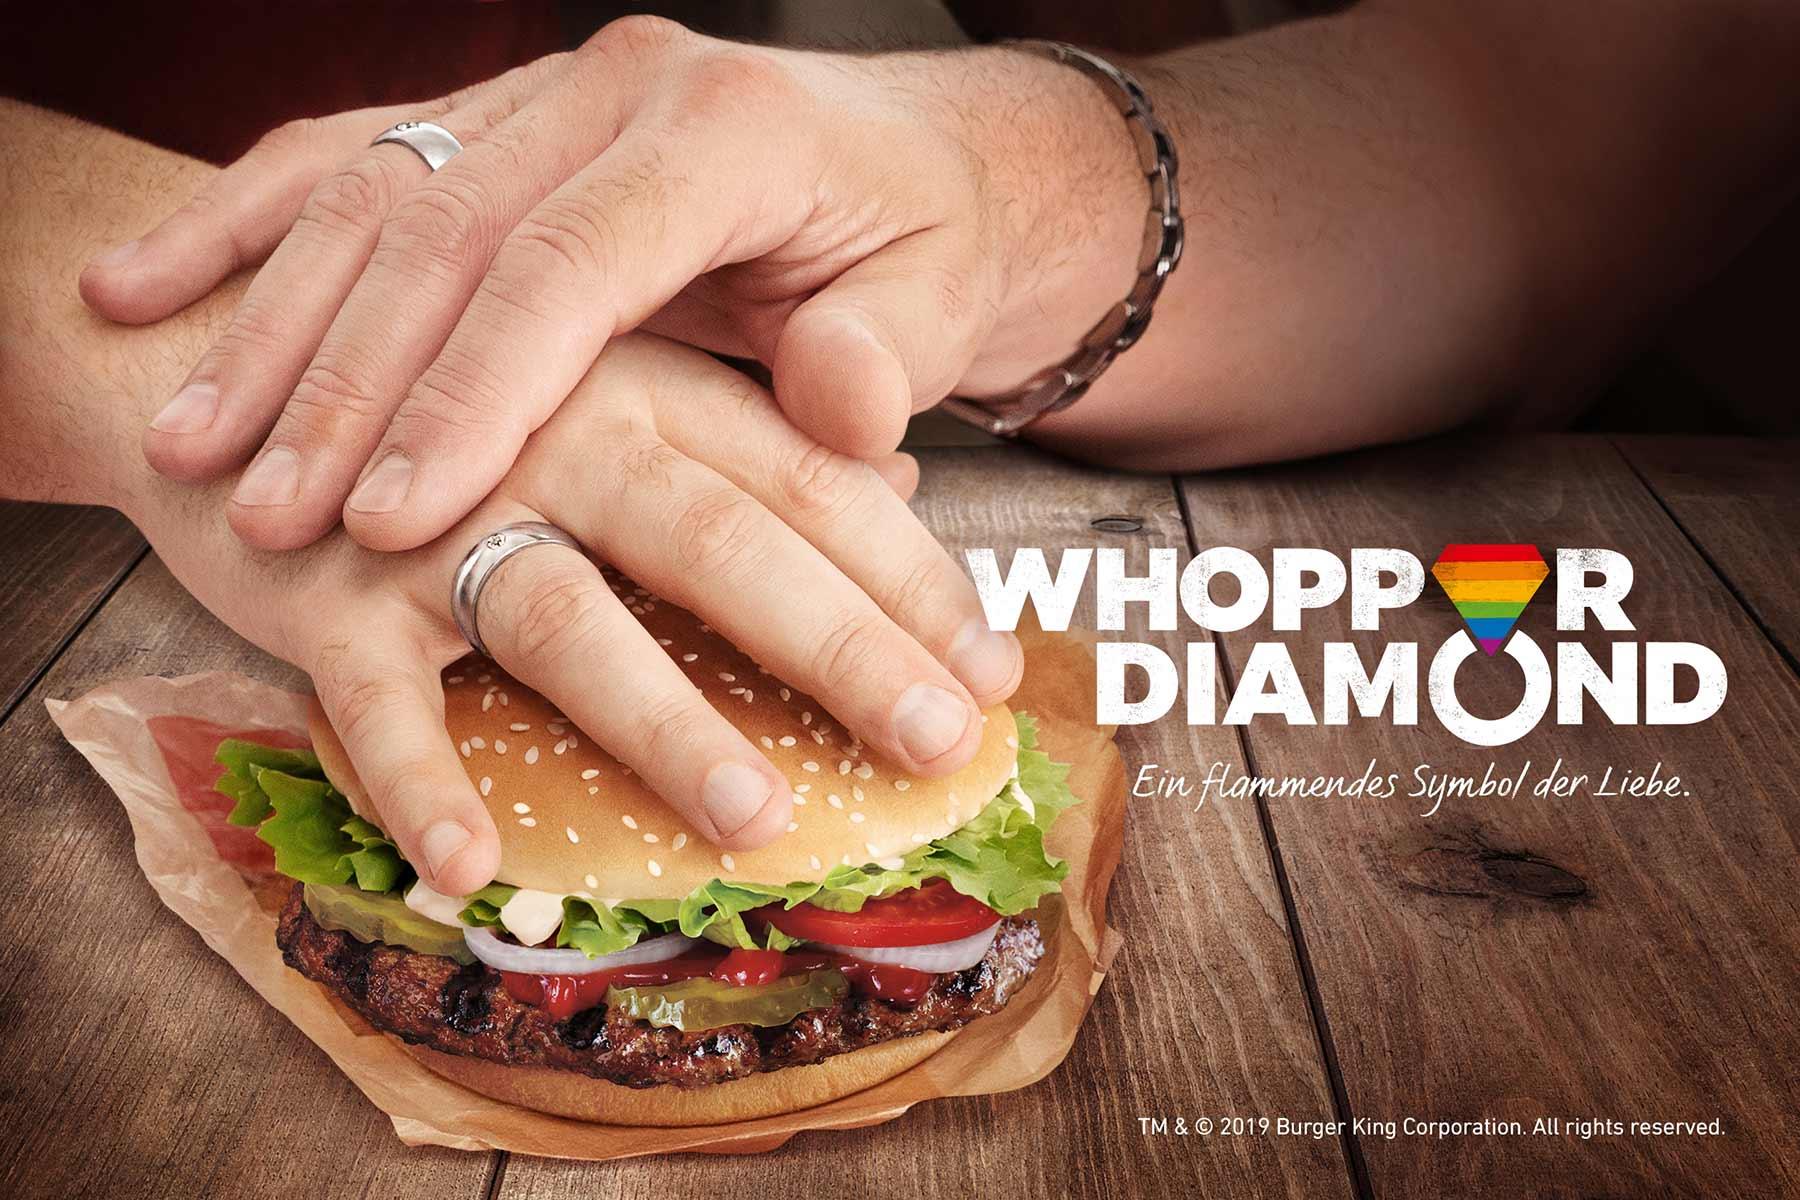 Burger King feiert Liebe in all ihren Fassetten mit Diamanten aus Whopper-Kohle burgerking_Whopper_Diamond_02